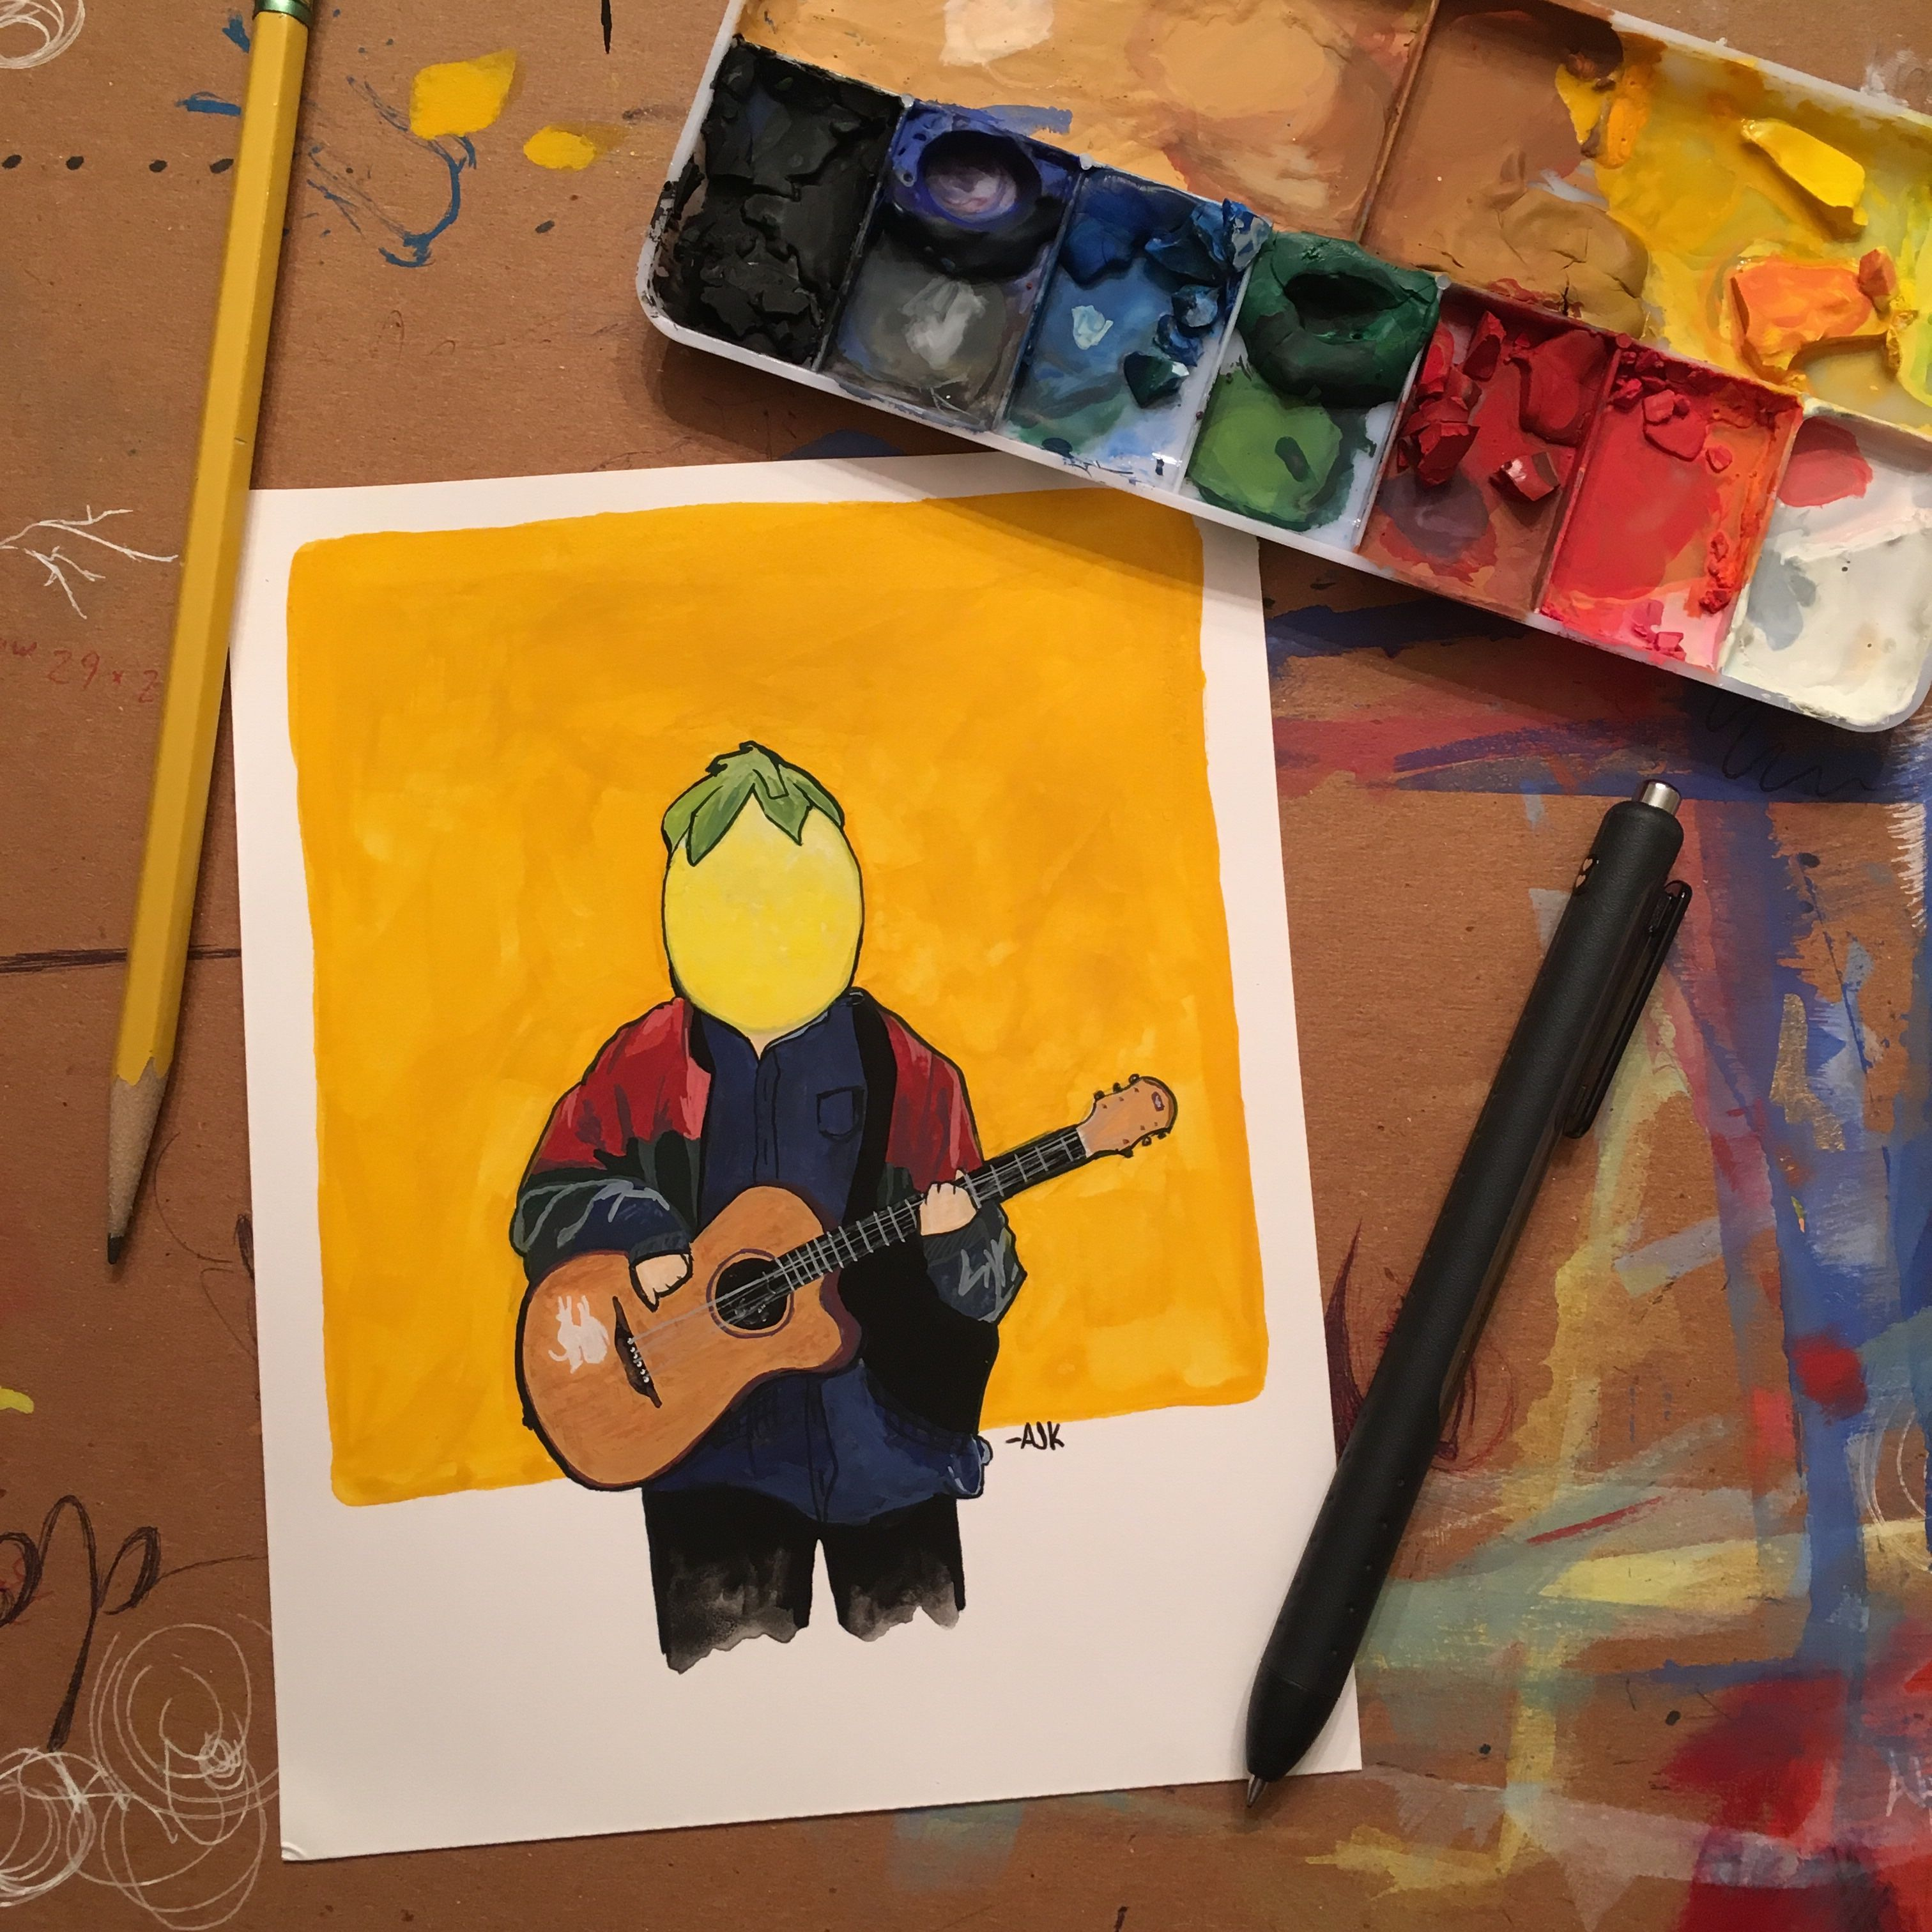 cavetown-lemon boy -ajk | Cavetown in 2019 | Art, Song